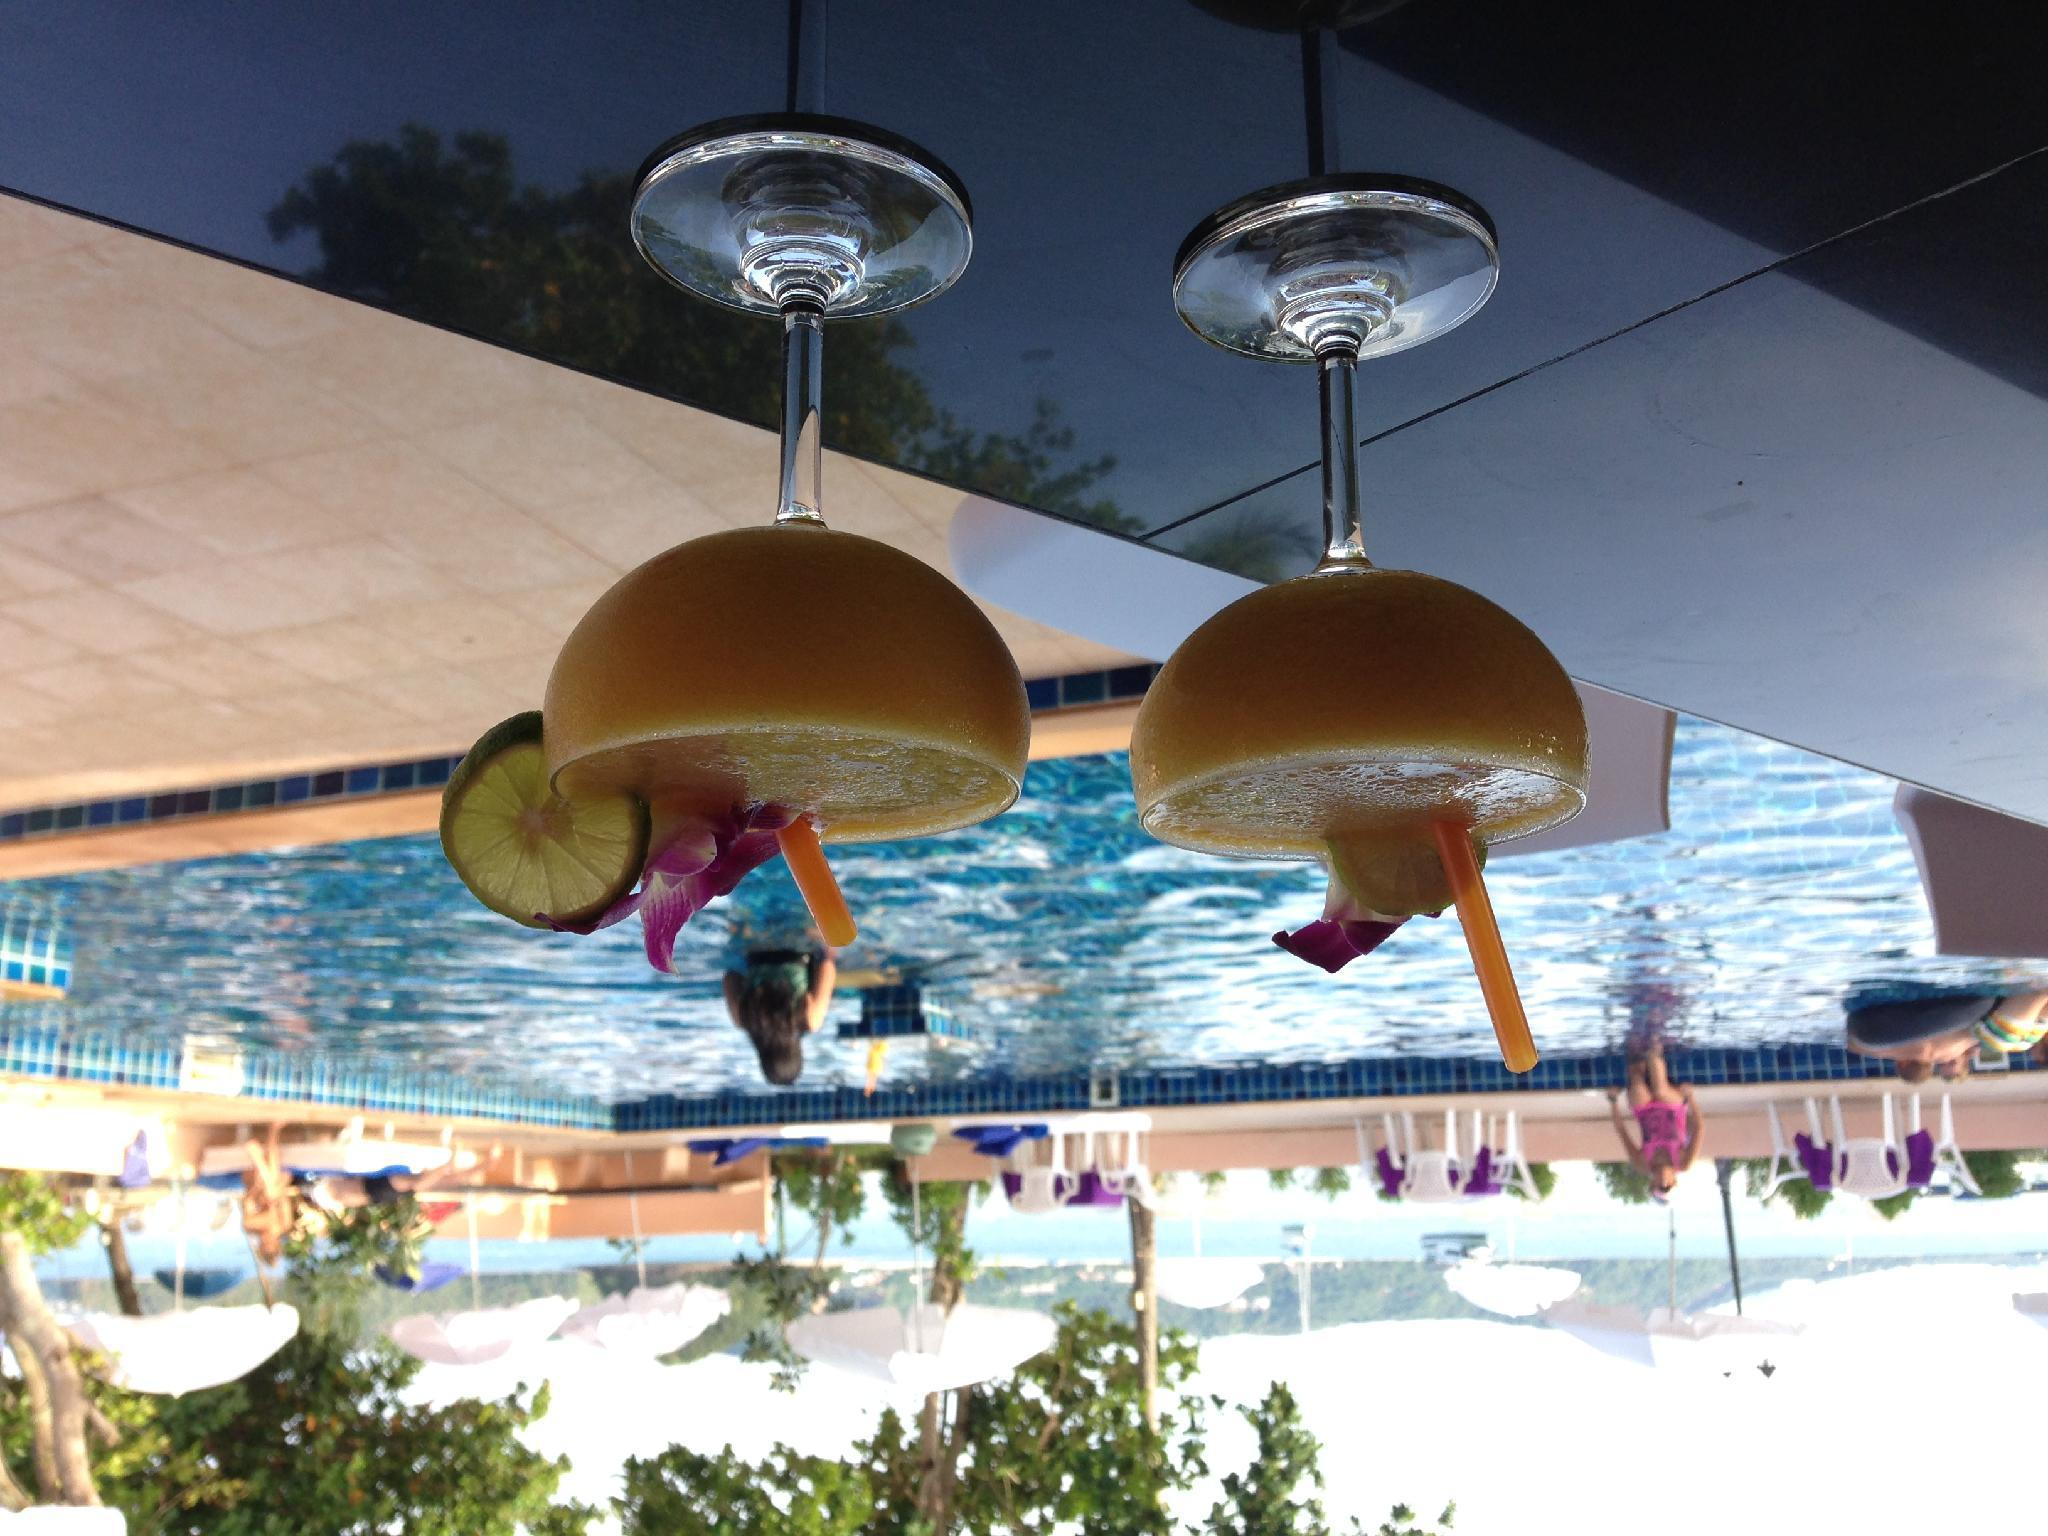 Cruiser Island Resort ครูเชอร์ ไอส์แลนด์ รีสอร์ต